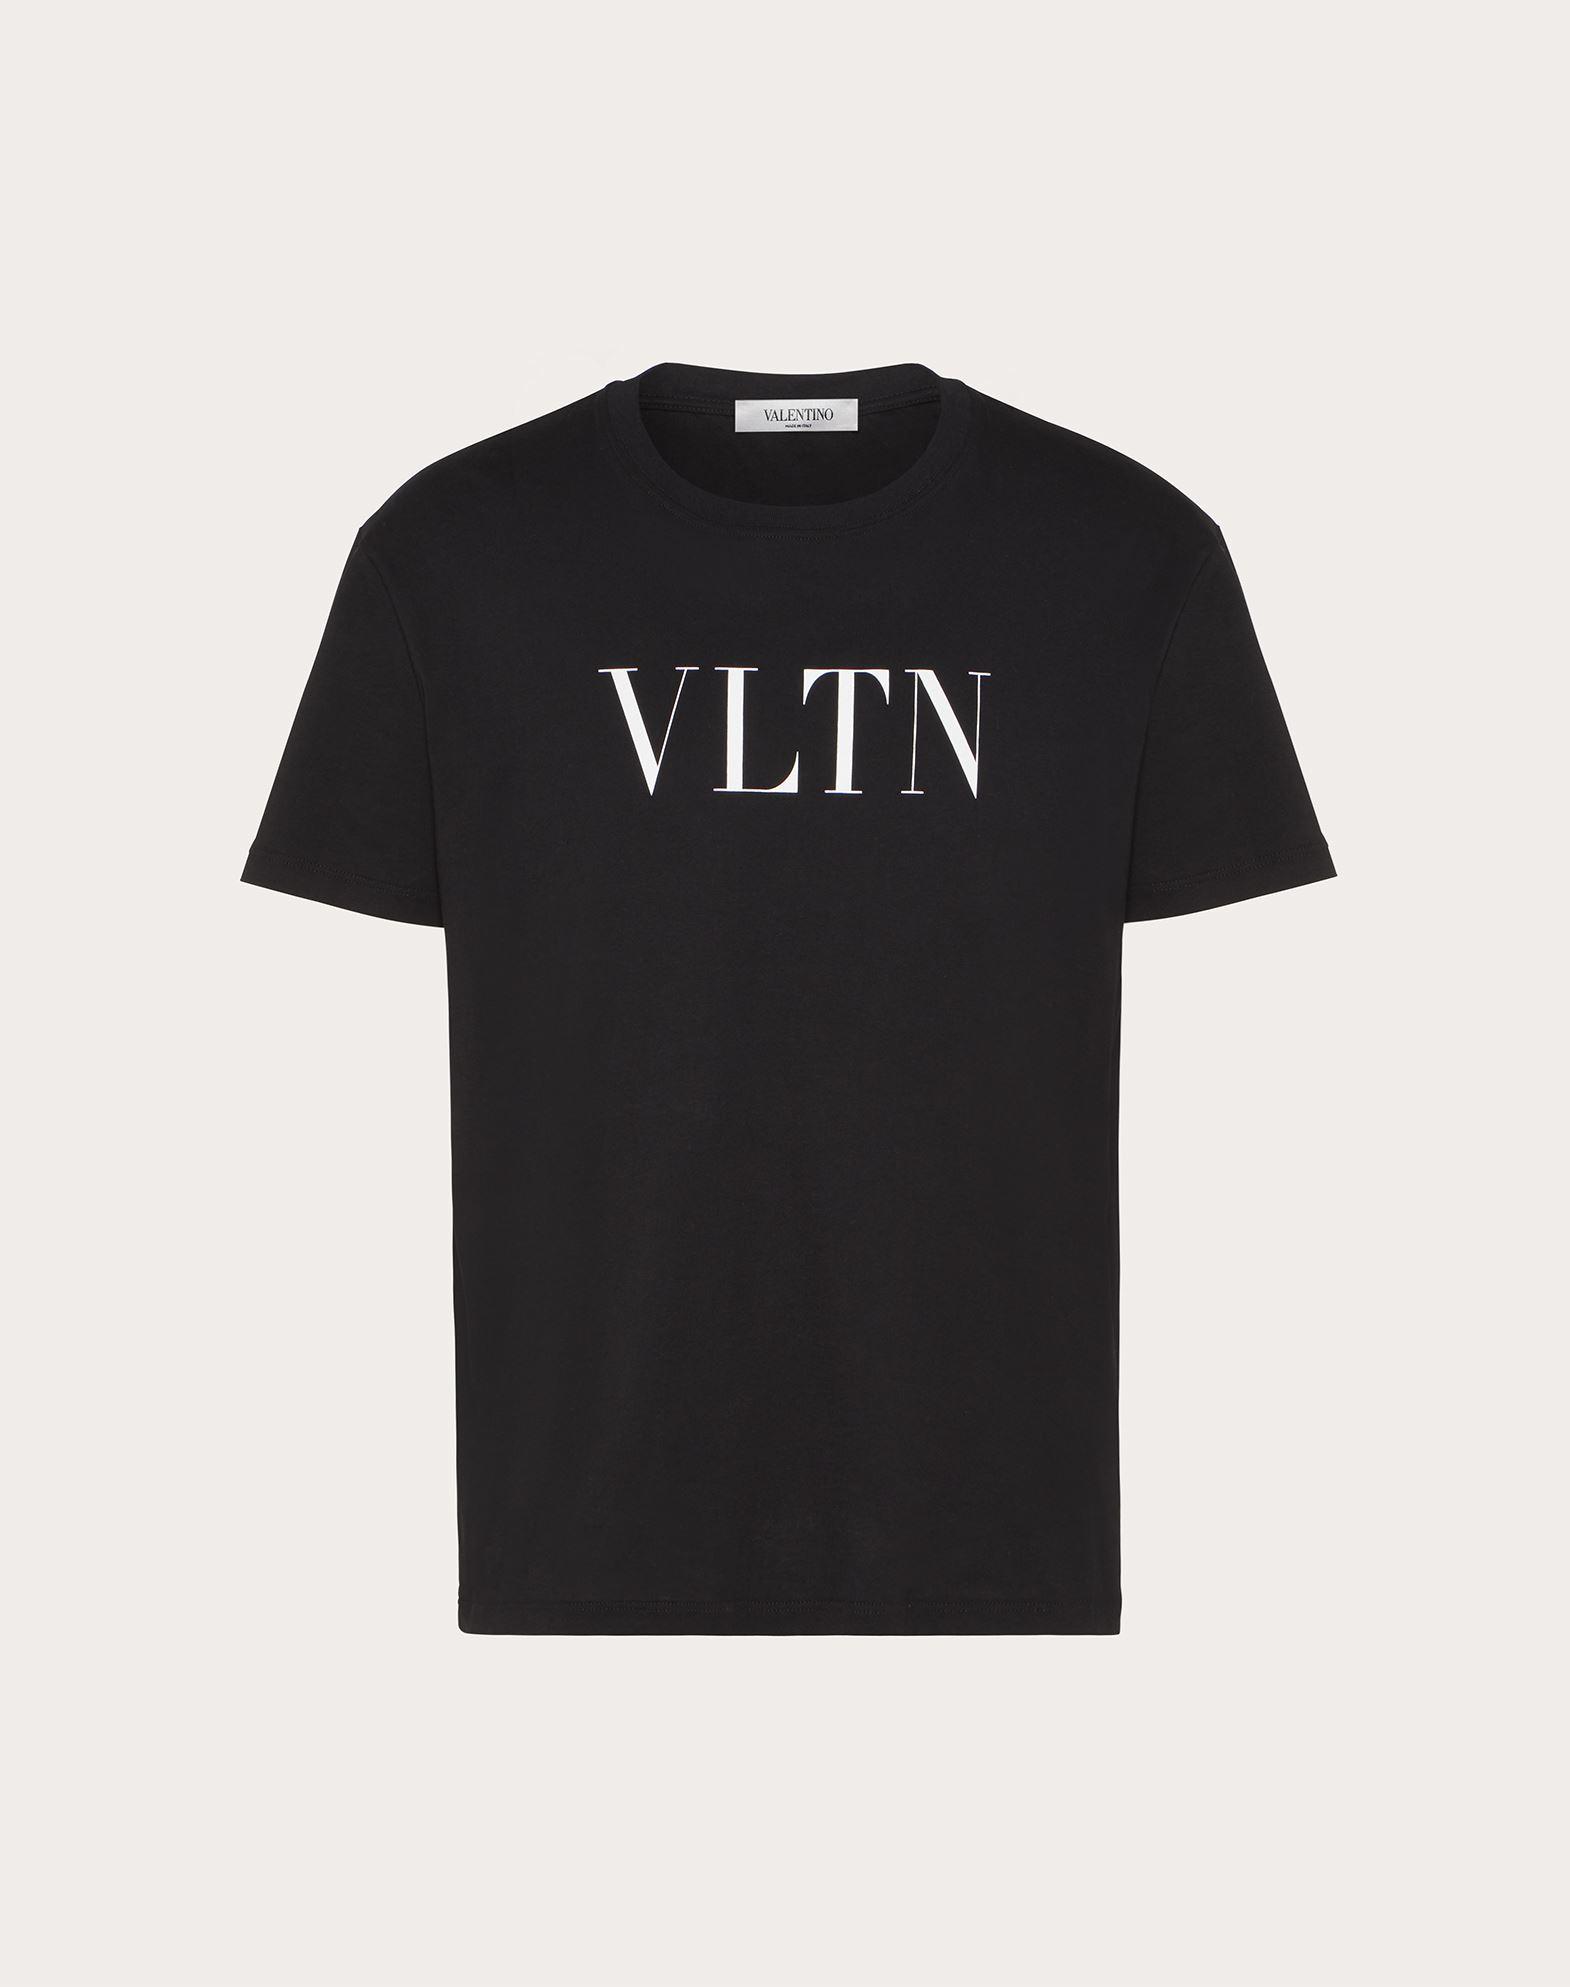 VALENTINO Black Cotton T-Shirt With Vltn Logo